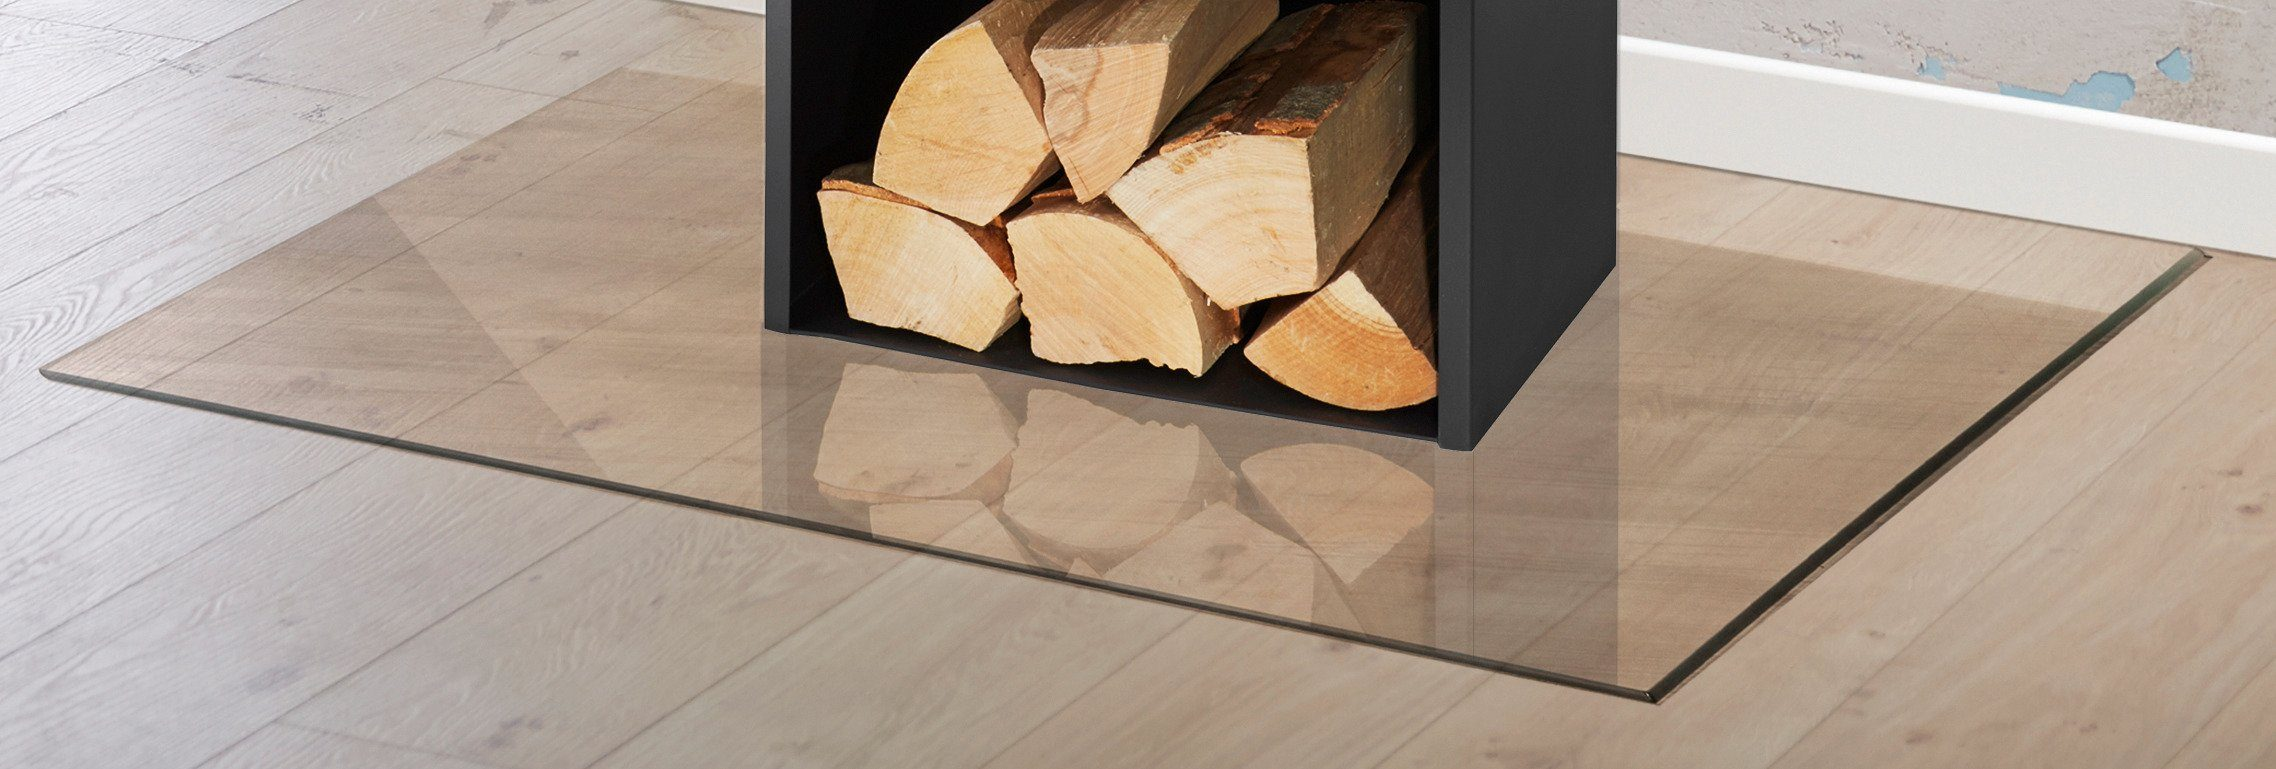 Glasbodenplatte »Rechteck«, 100 x 120 cm, transparent, zum Funkenschutz